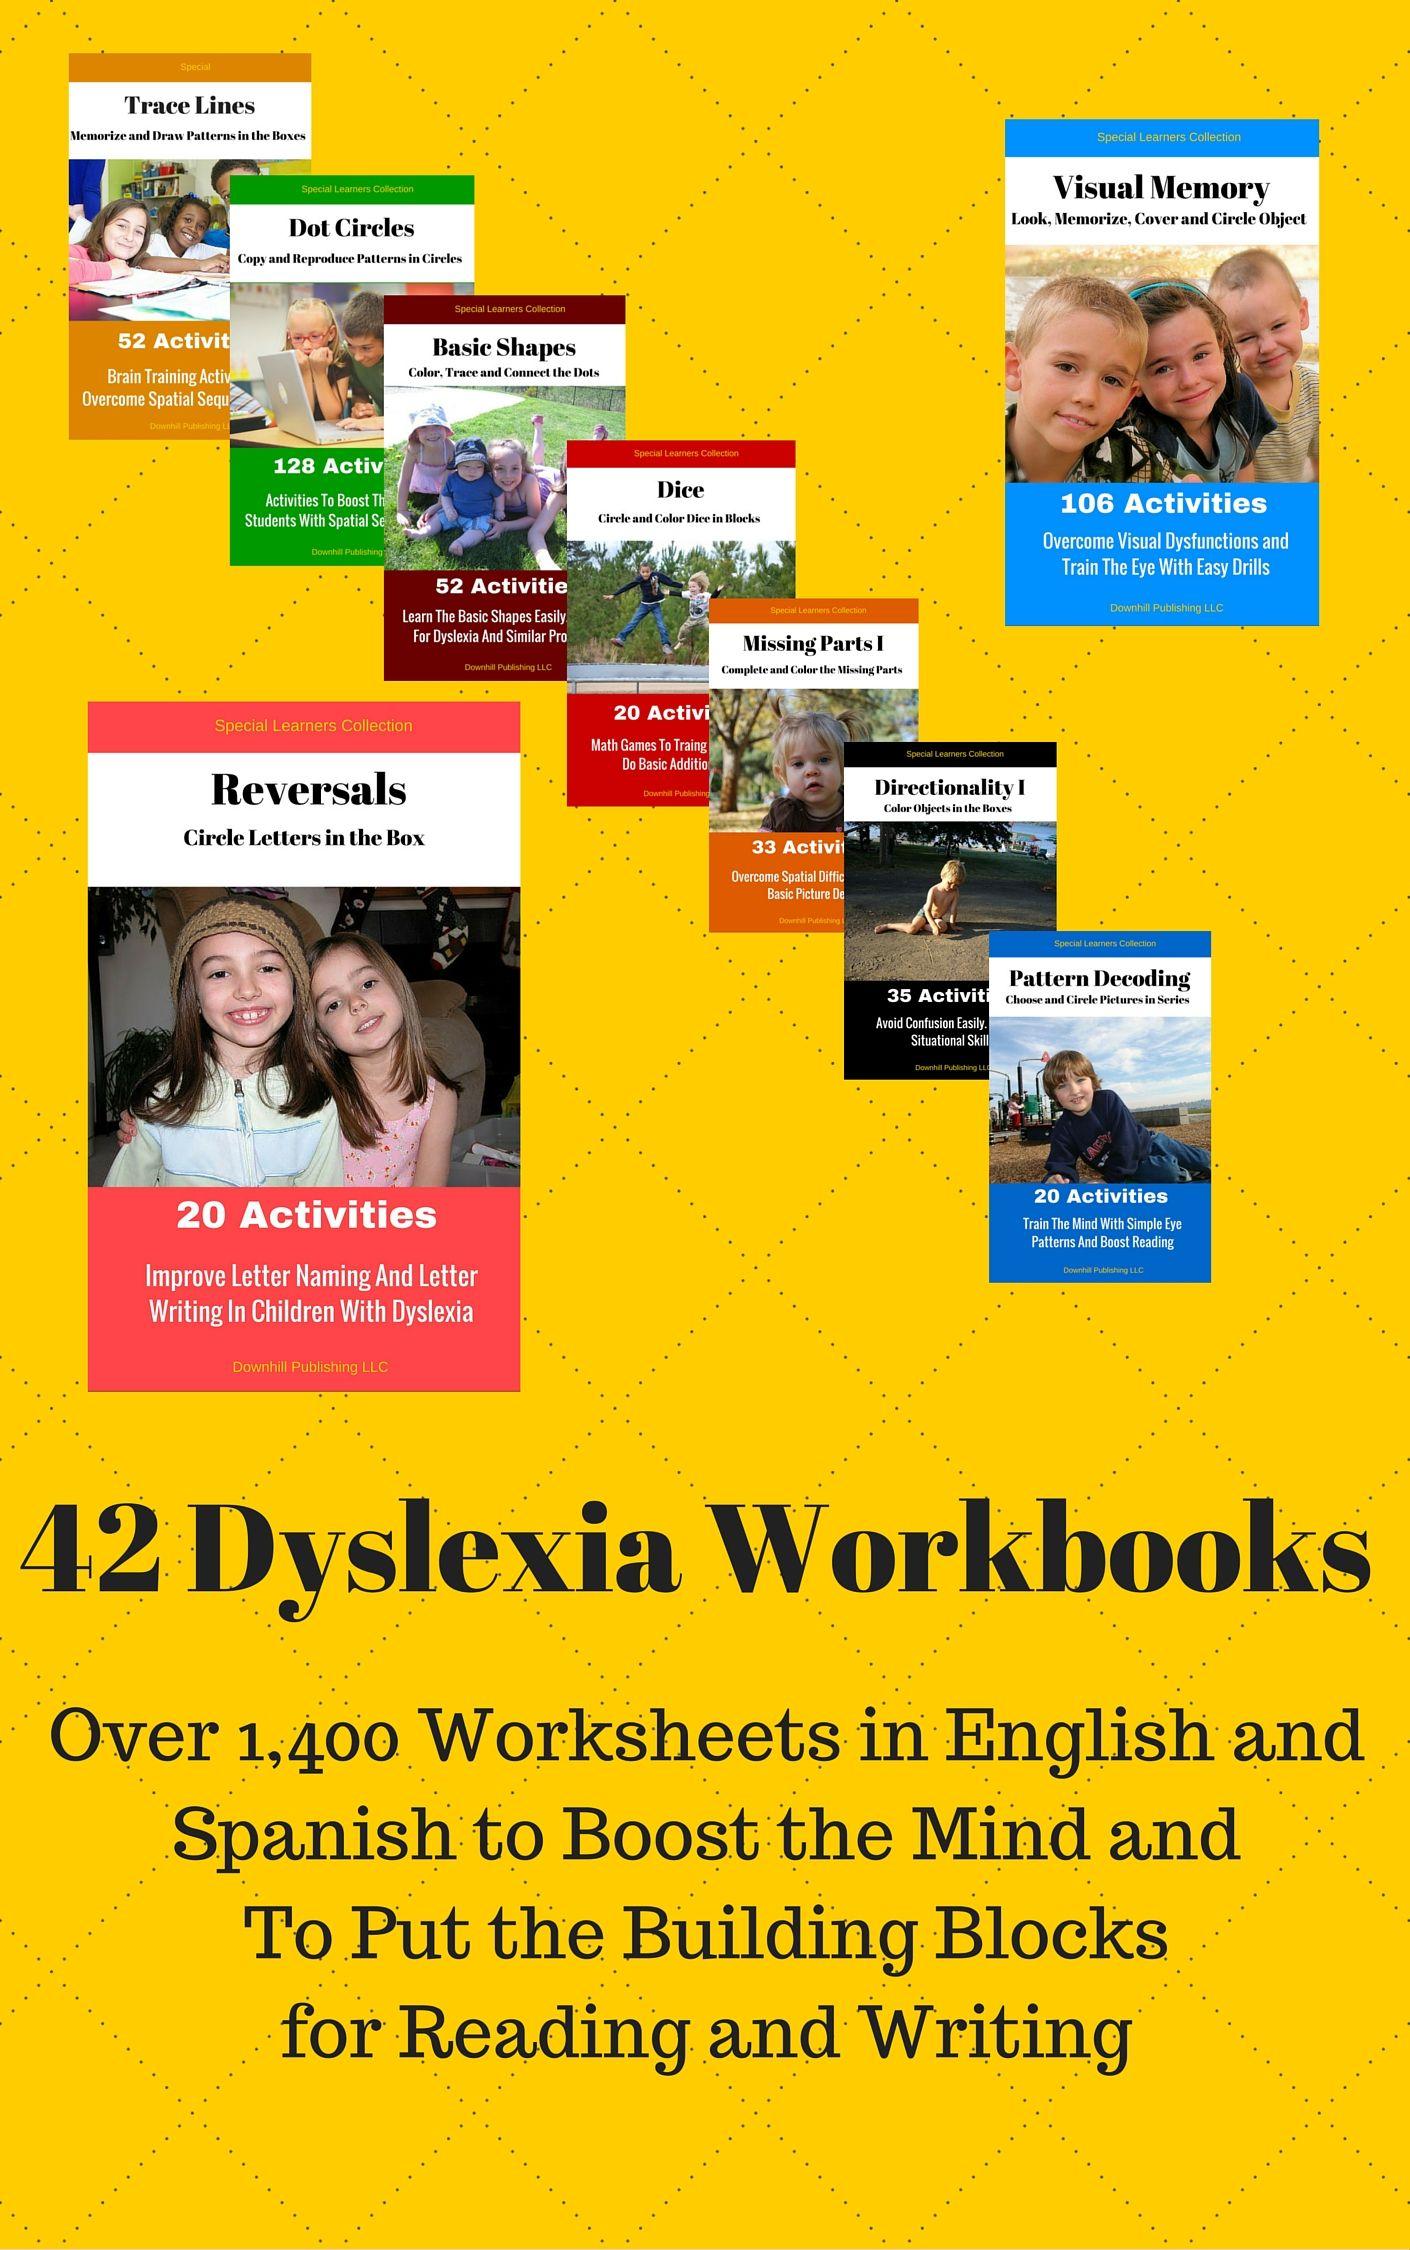 16 Dyslexia Worksheets Exercices